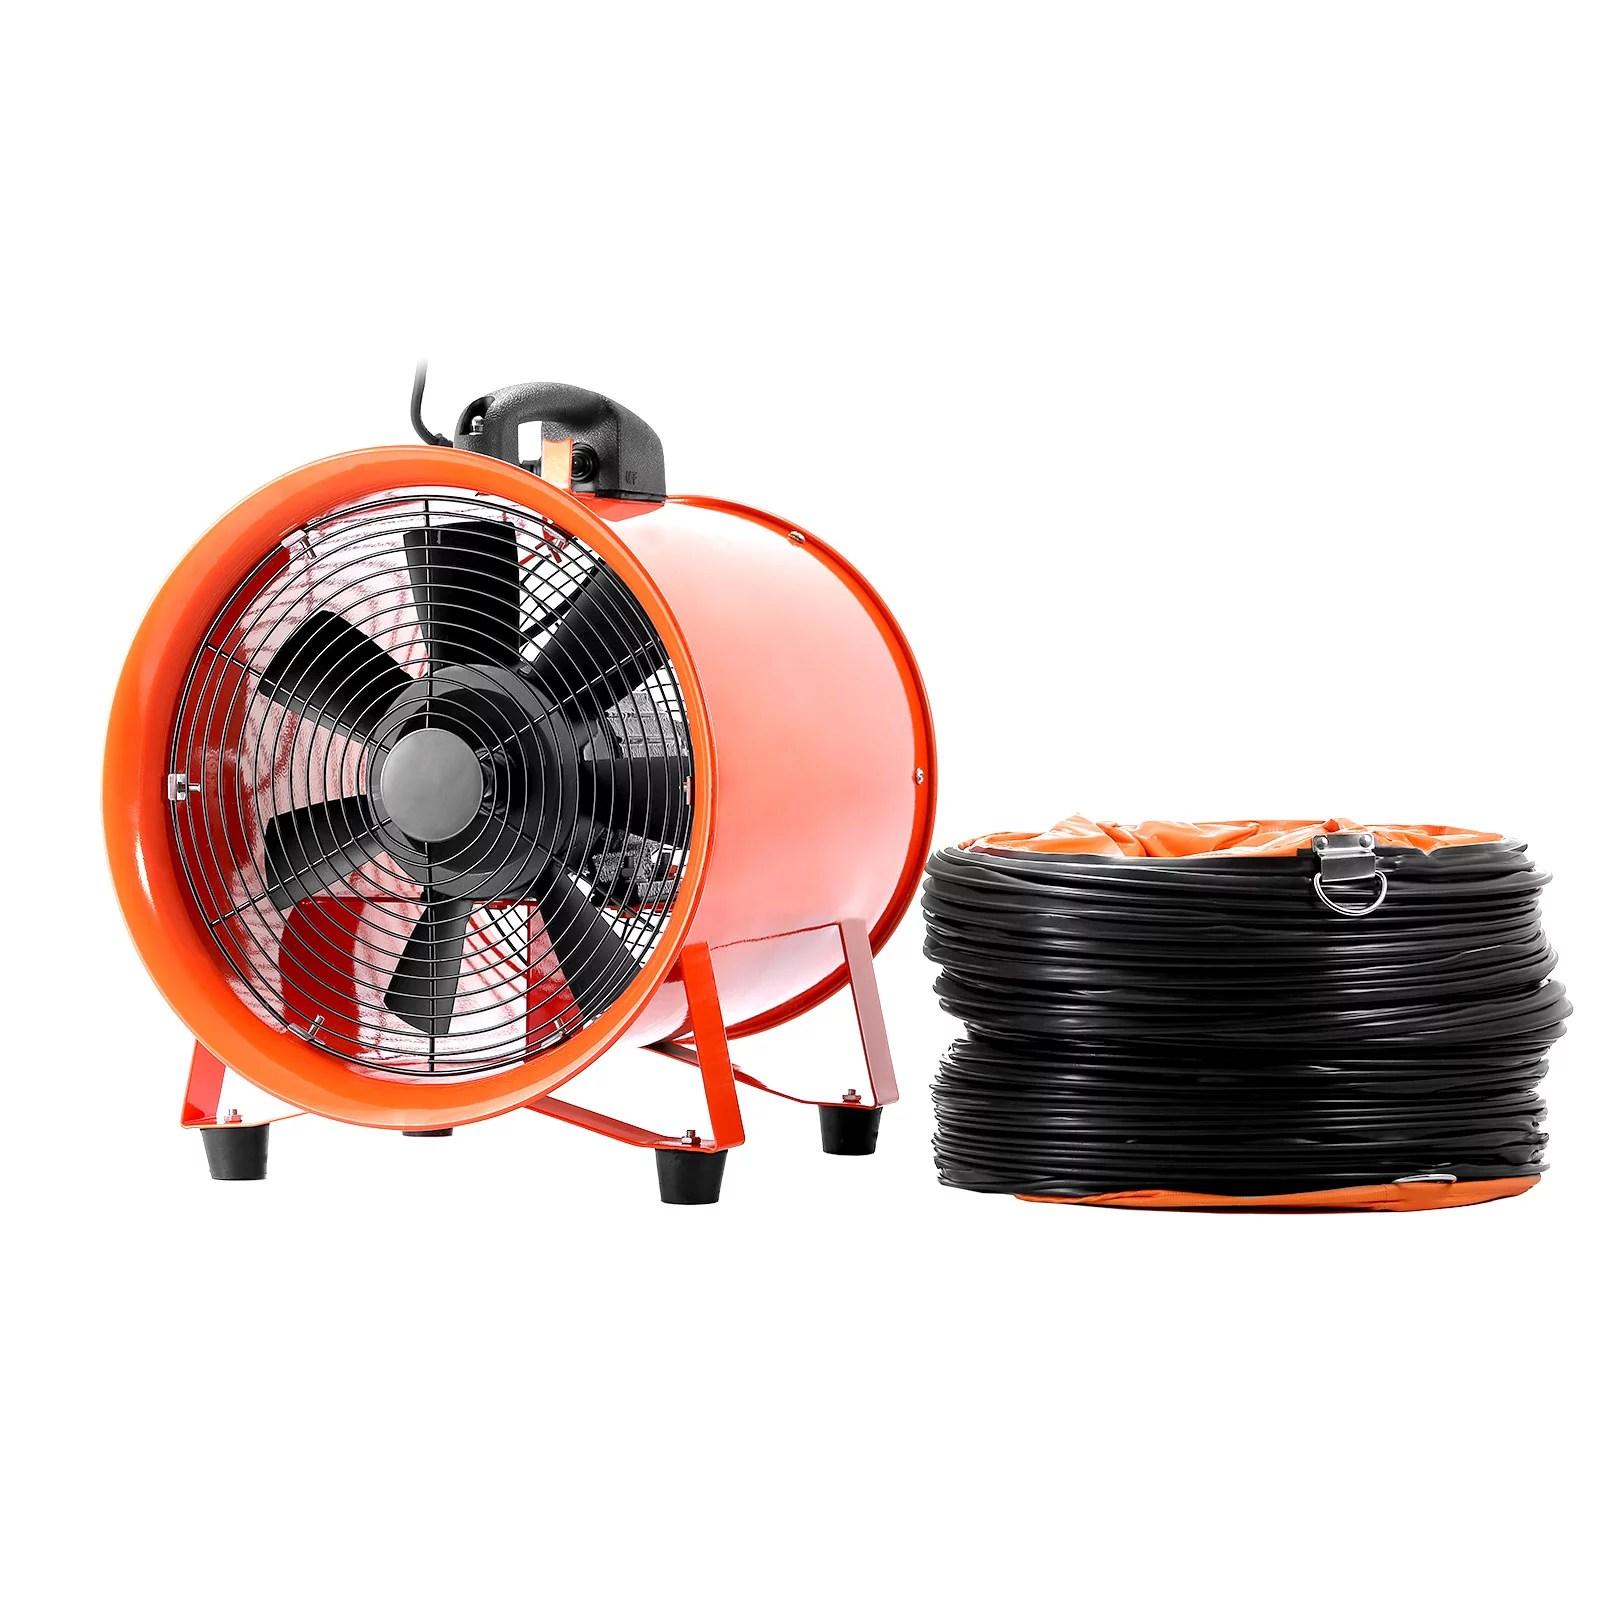 bestequip 12 extractor fan blower portable 5m duct hose fume utility ventilation exhaust walmart com